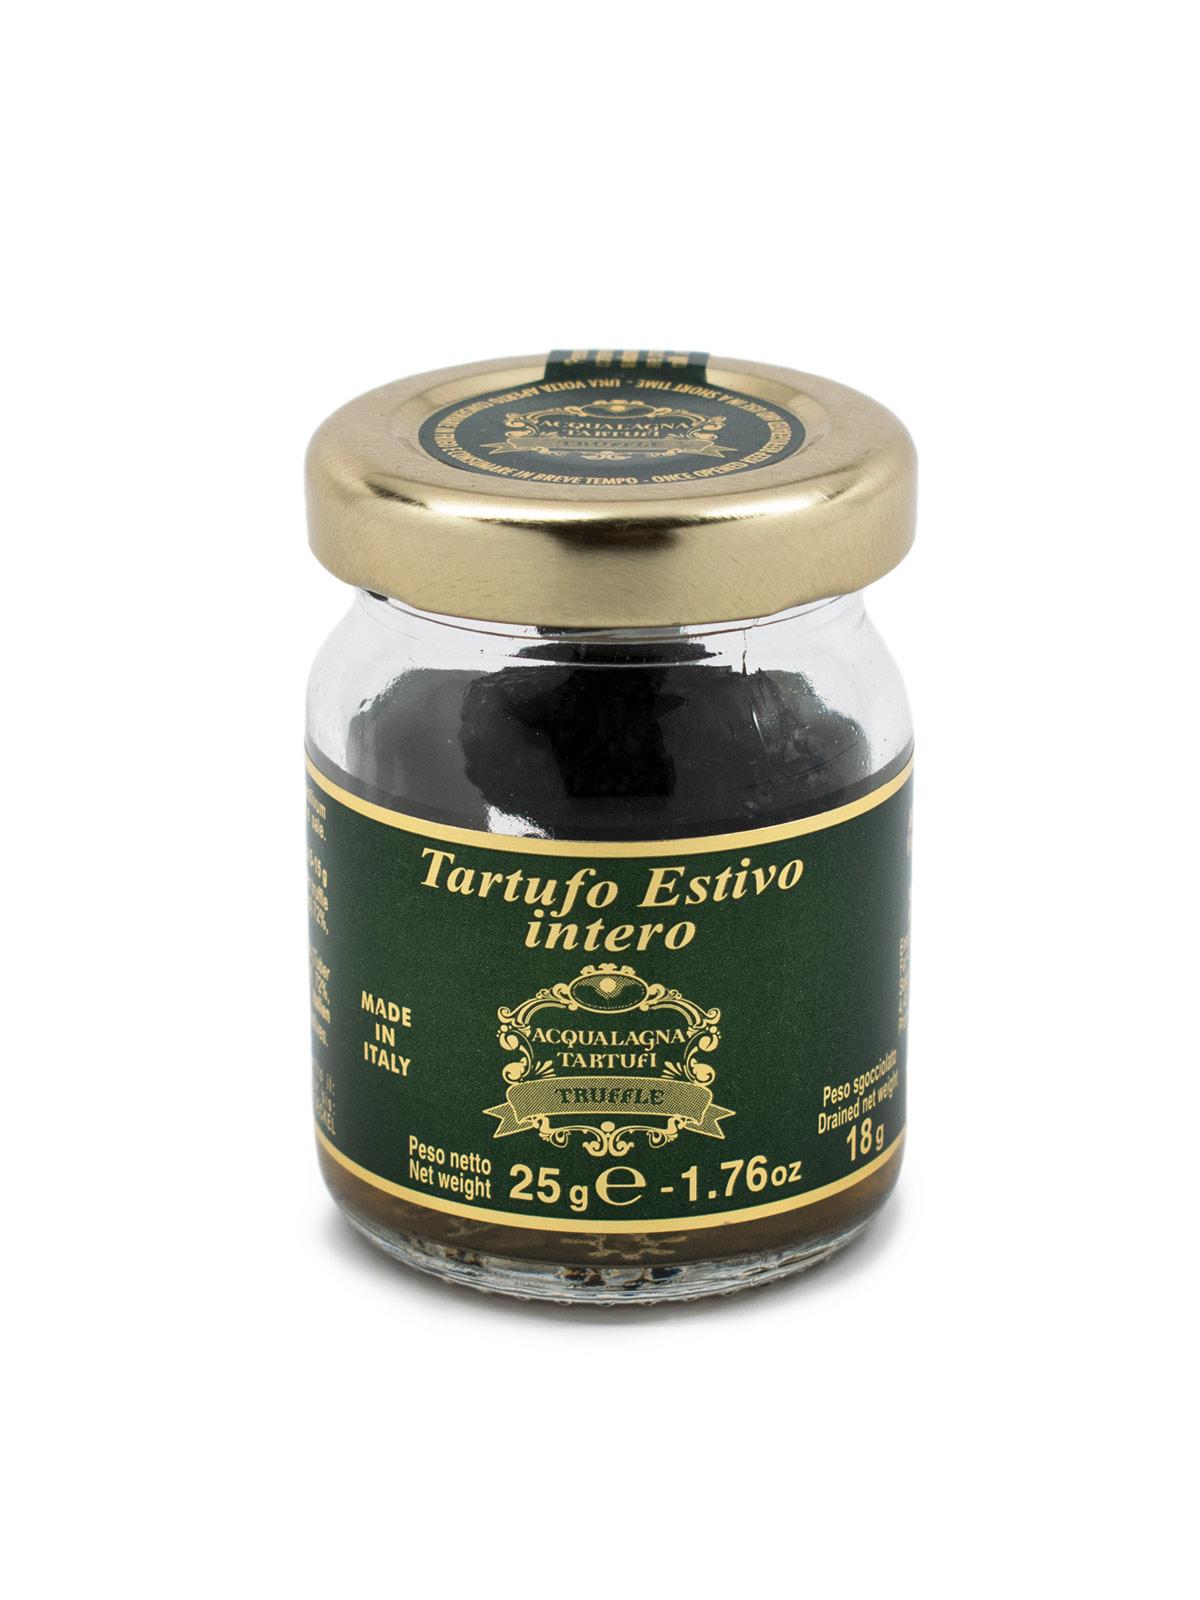 Black Summer Truffle - Truffles - Buon'Italia